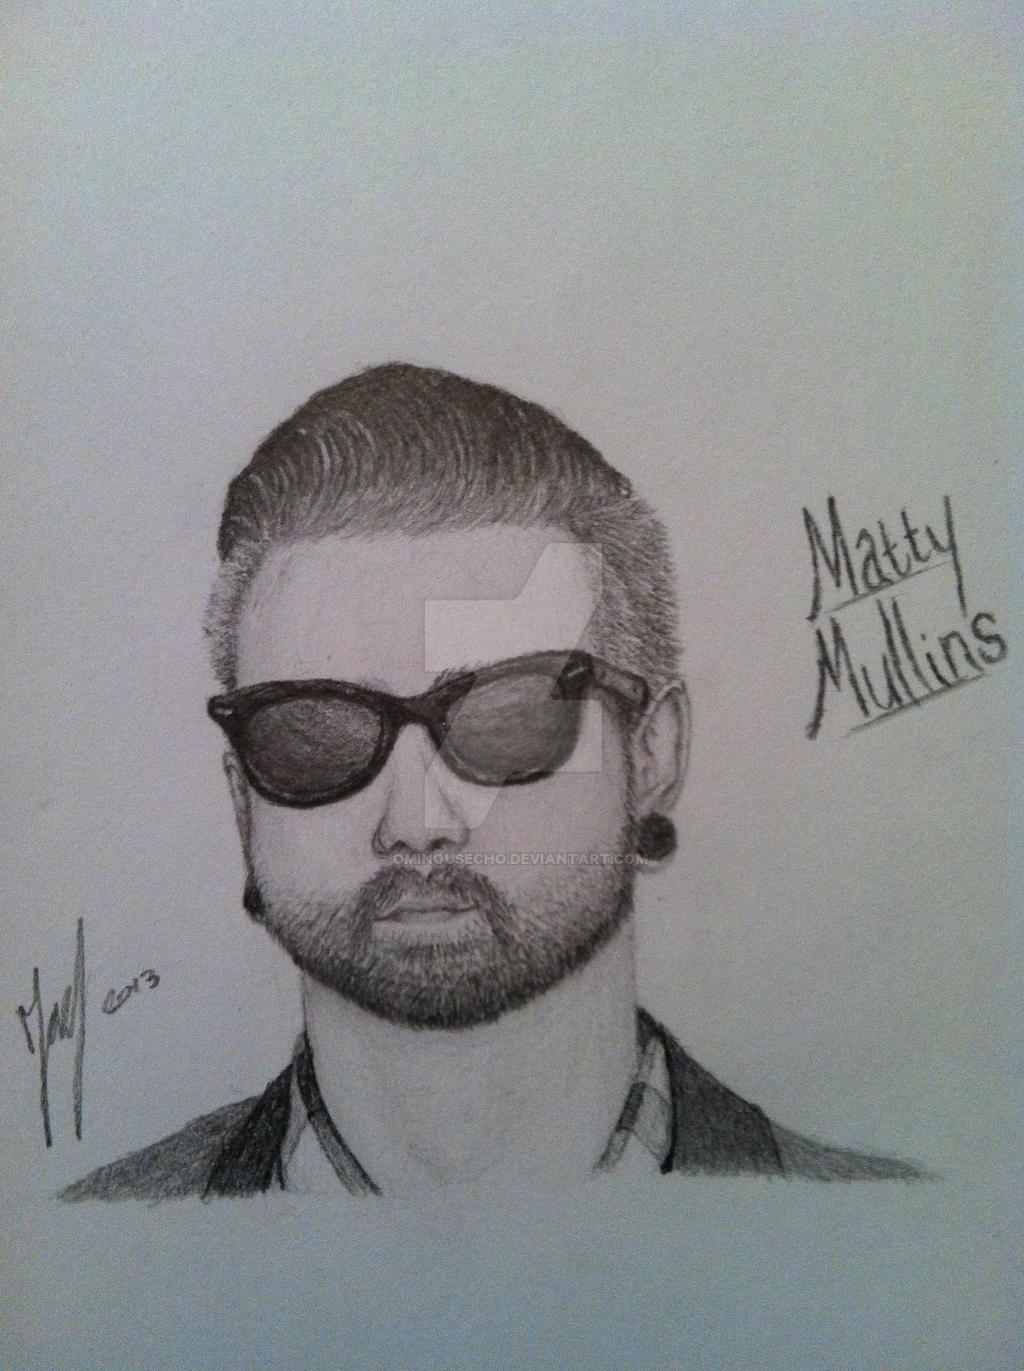 Matty Mullins Wallpaper